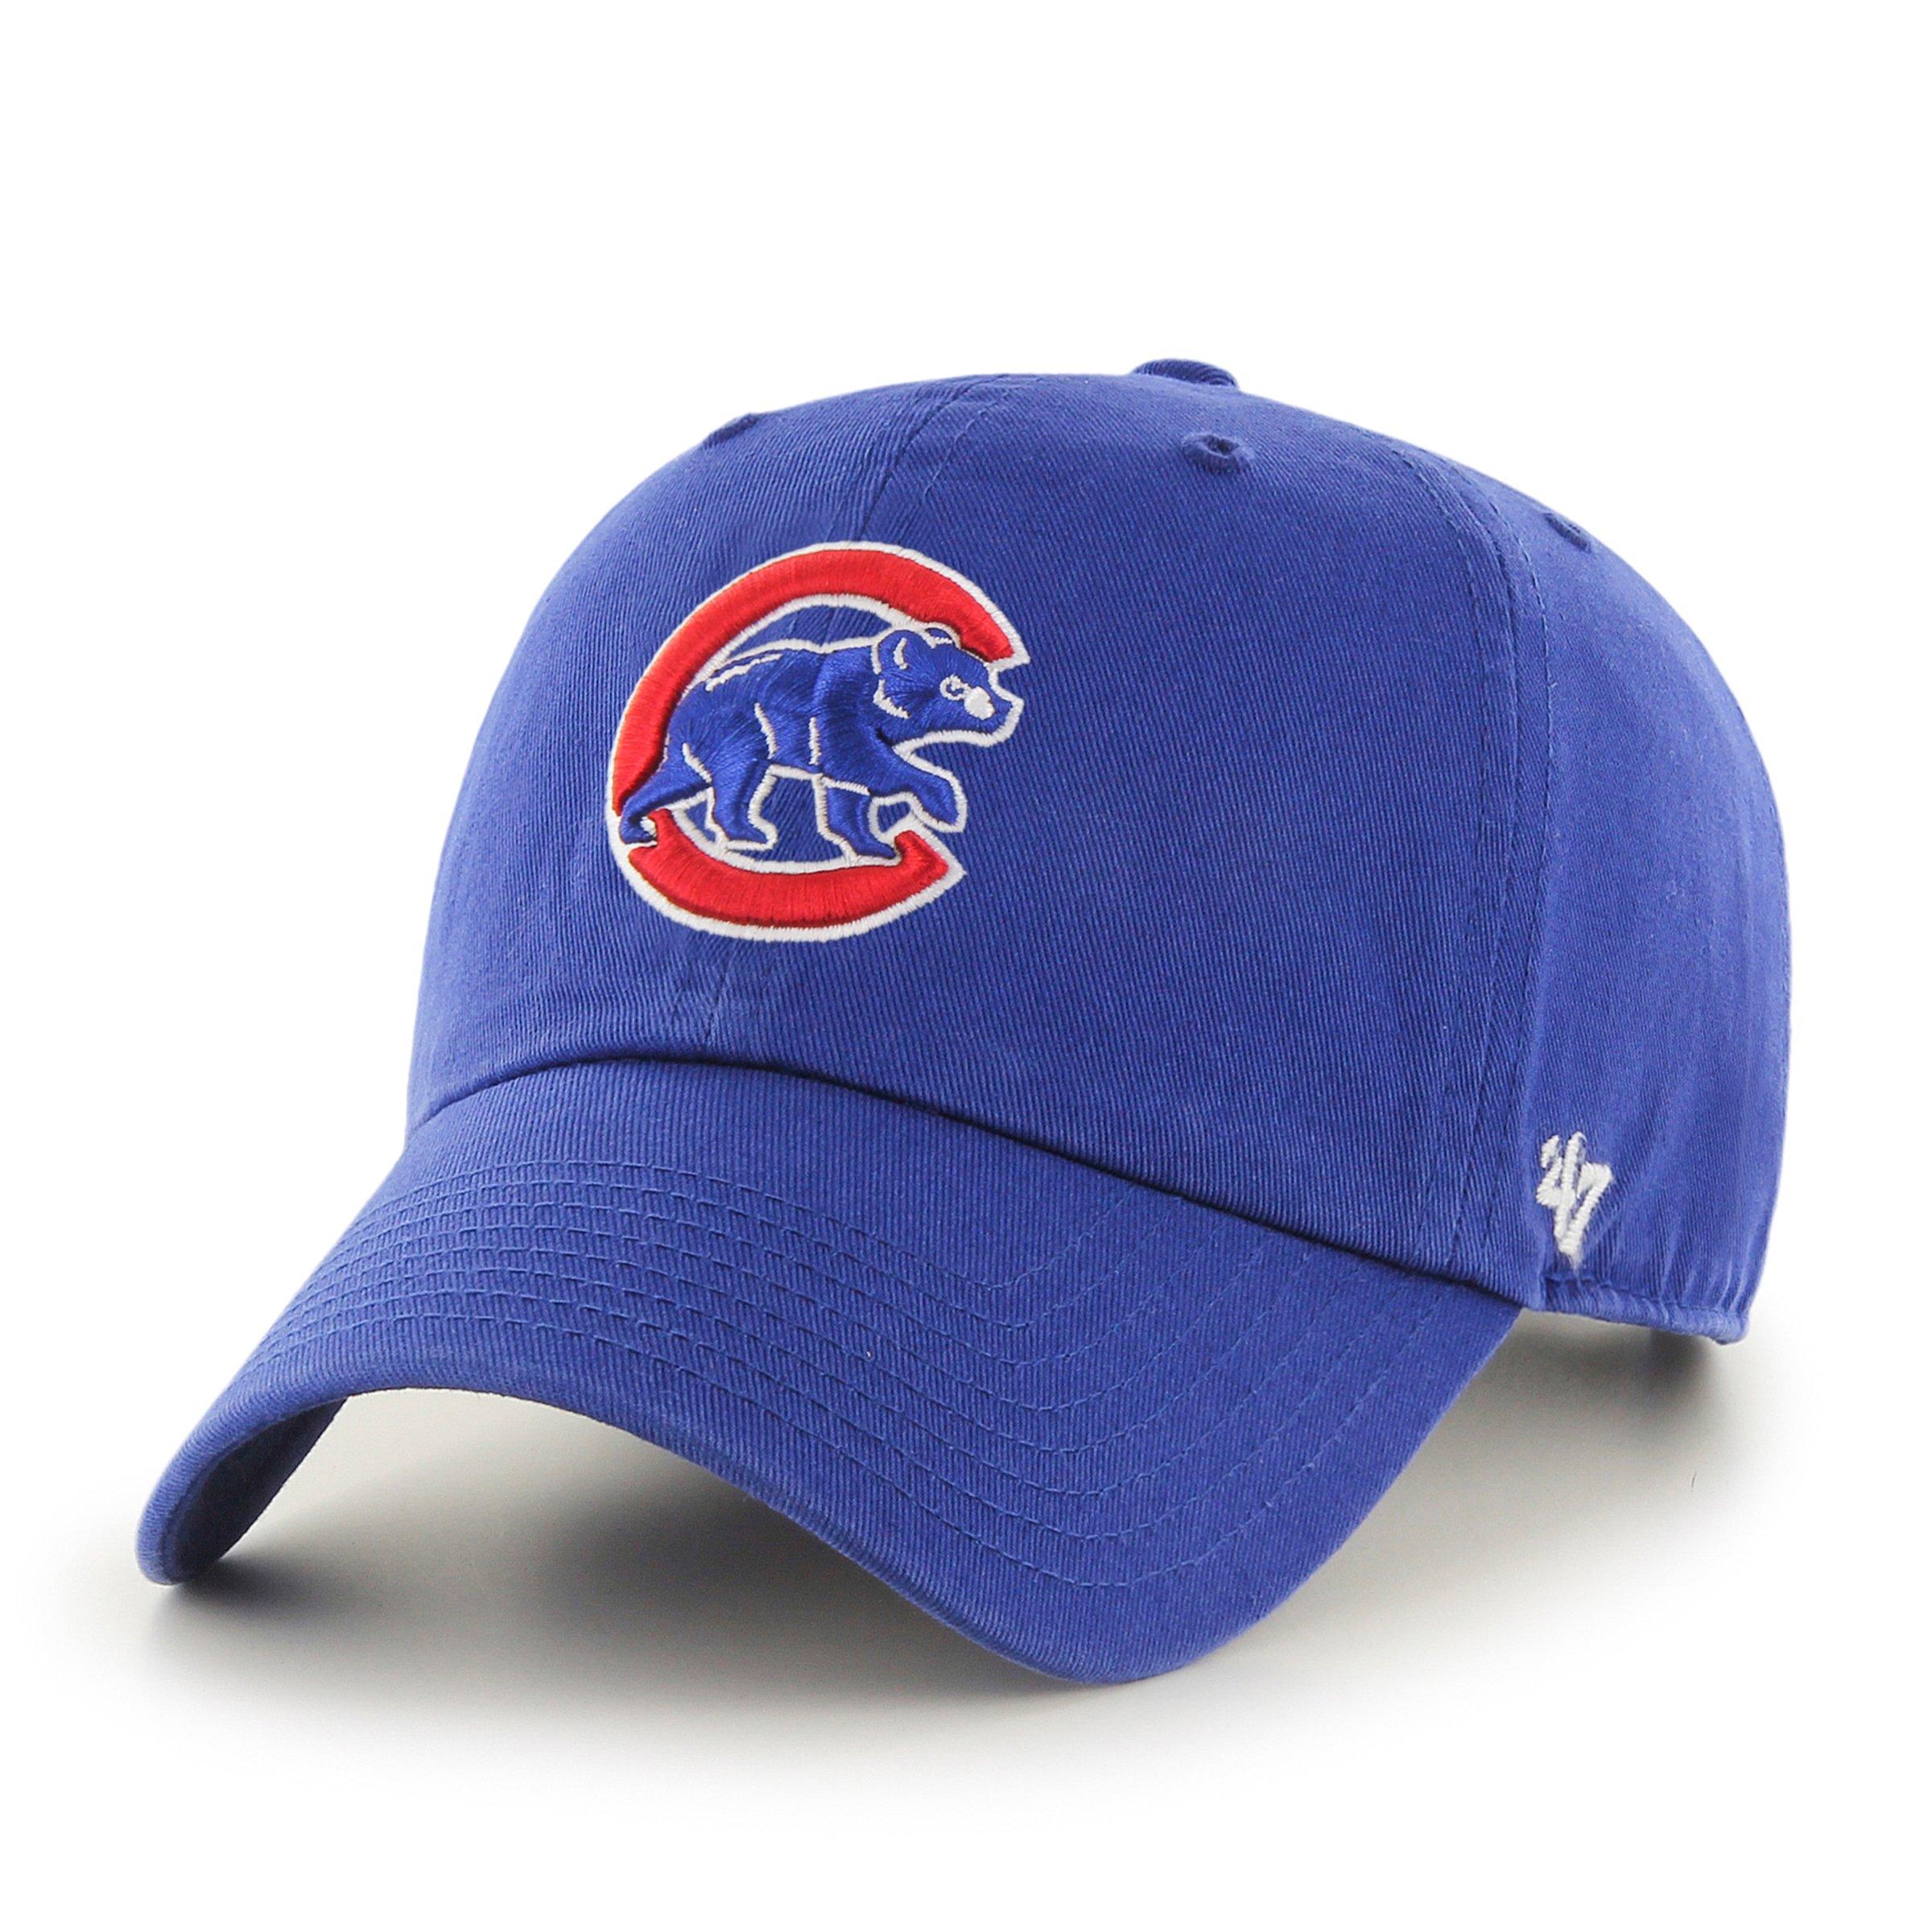 MLB Chicago Cubs '47 Clean Up Adjustable Hat, Royal - Alternate, One Size